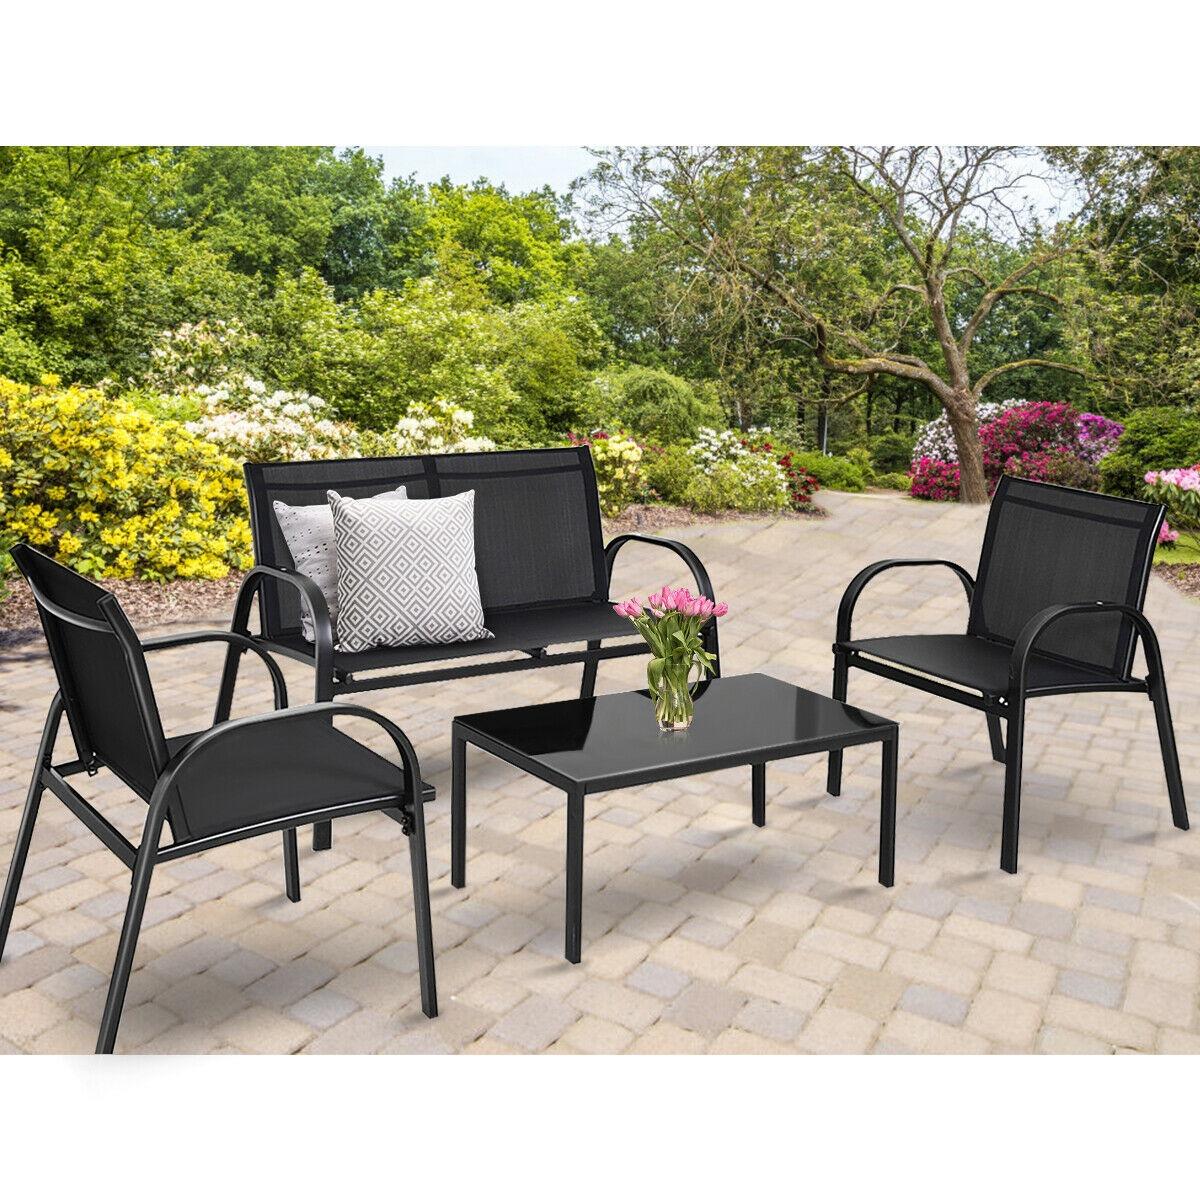 four piece black patio set